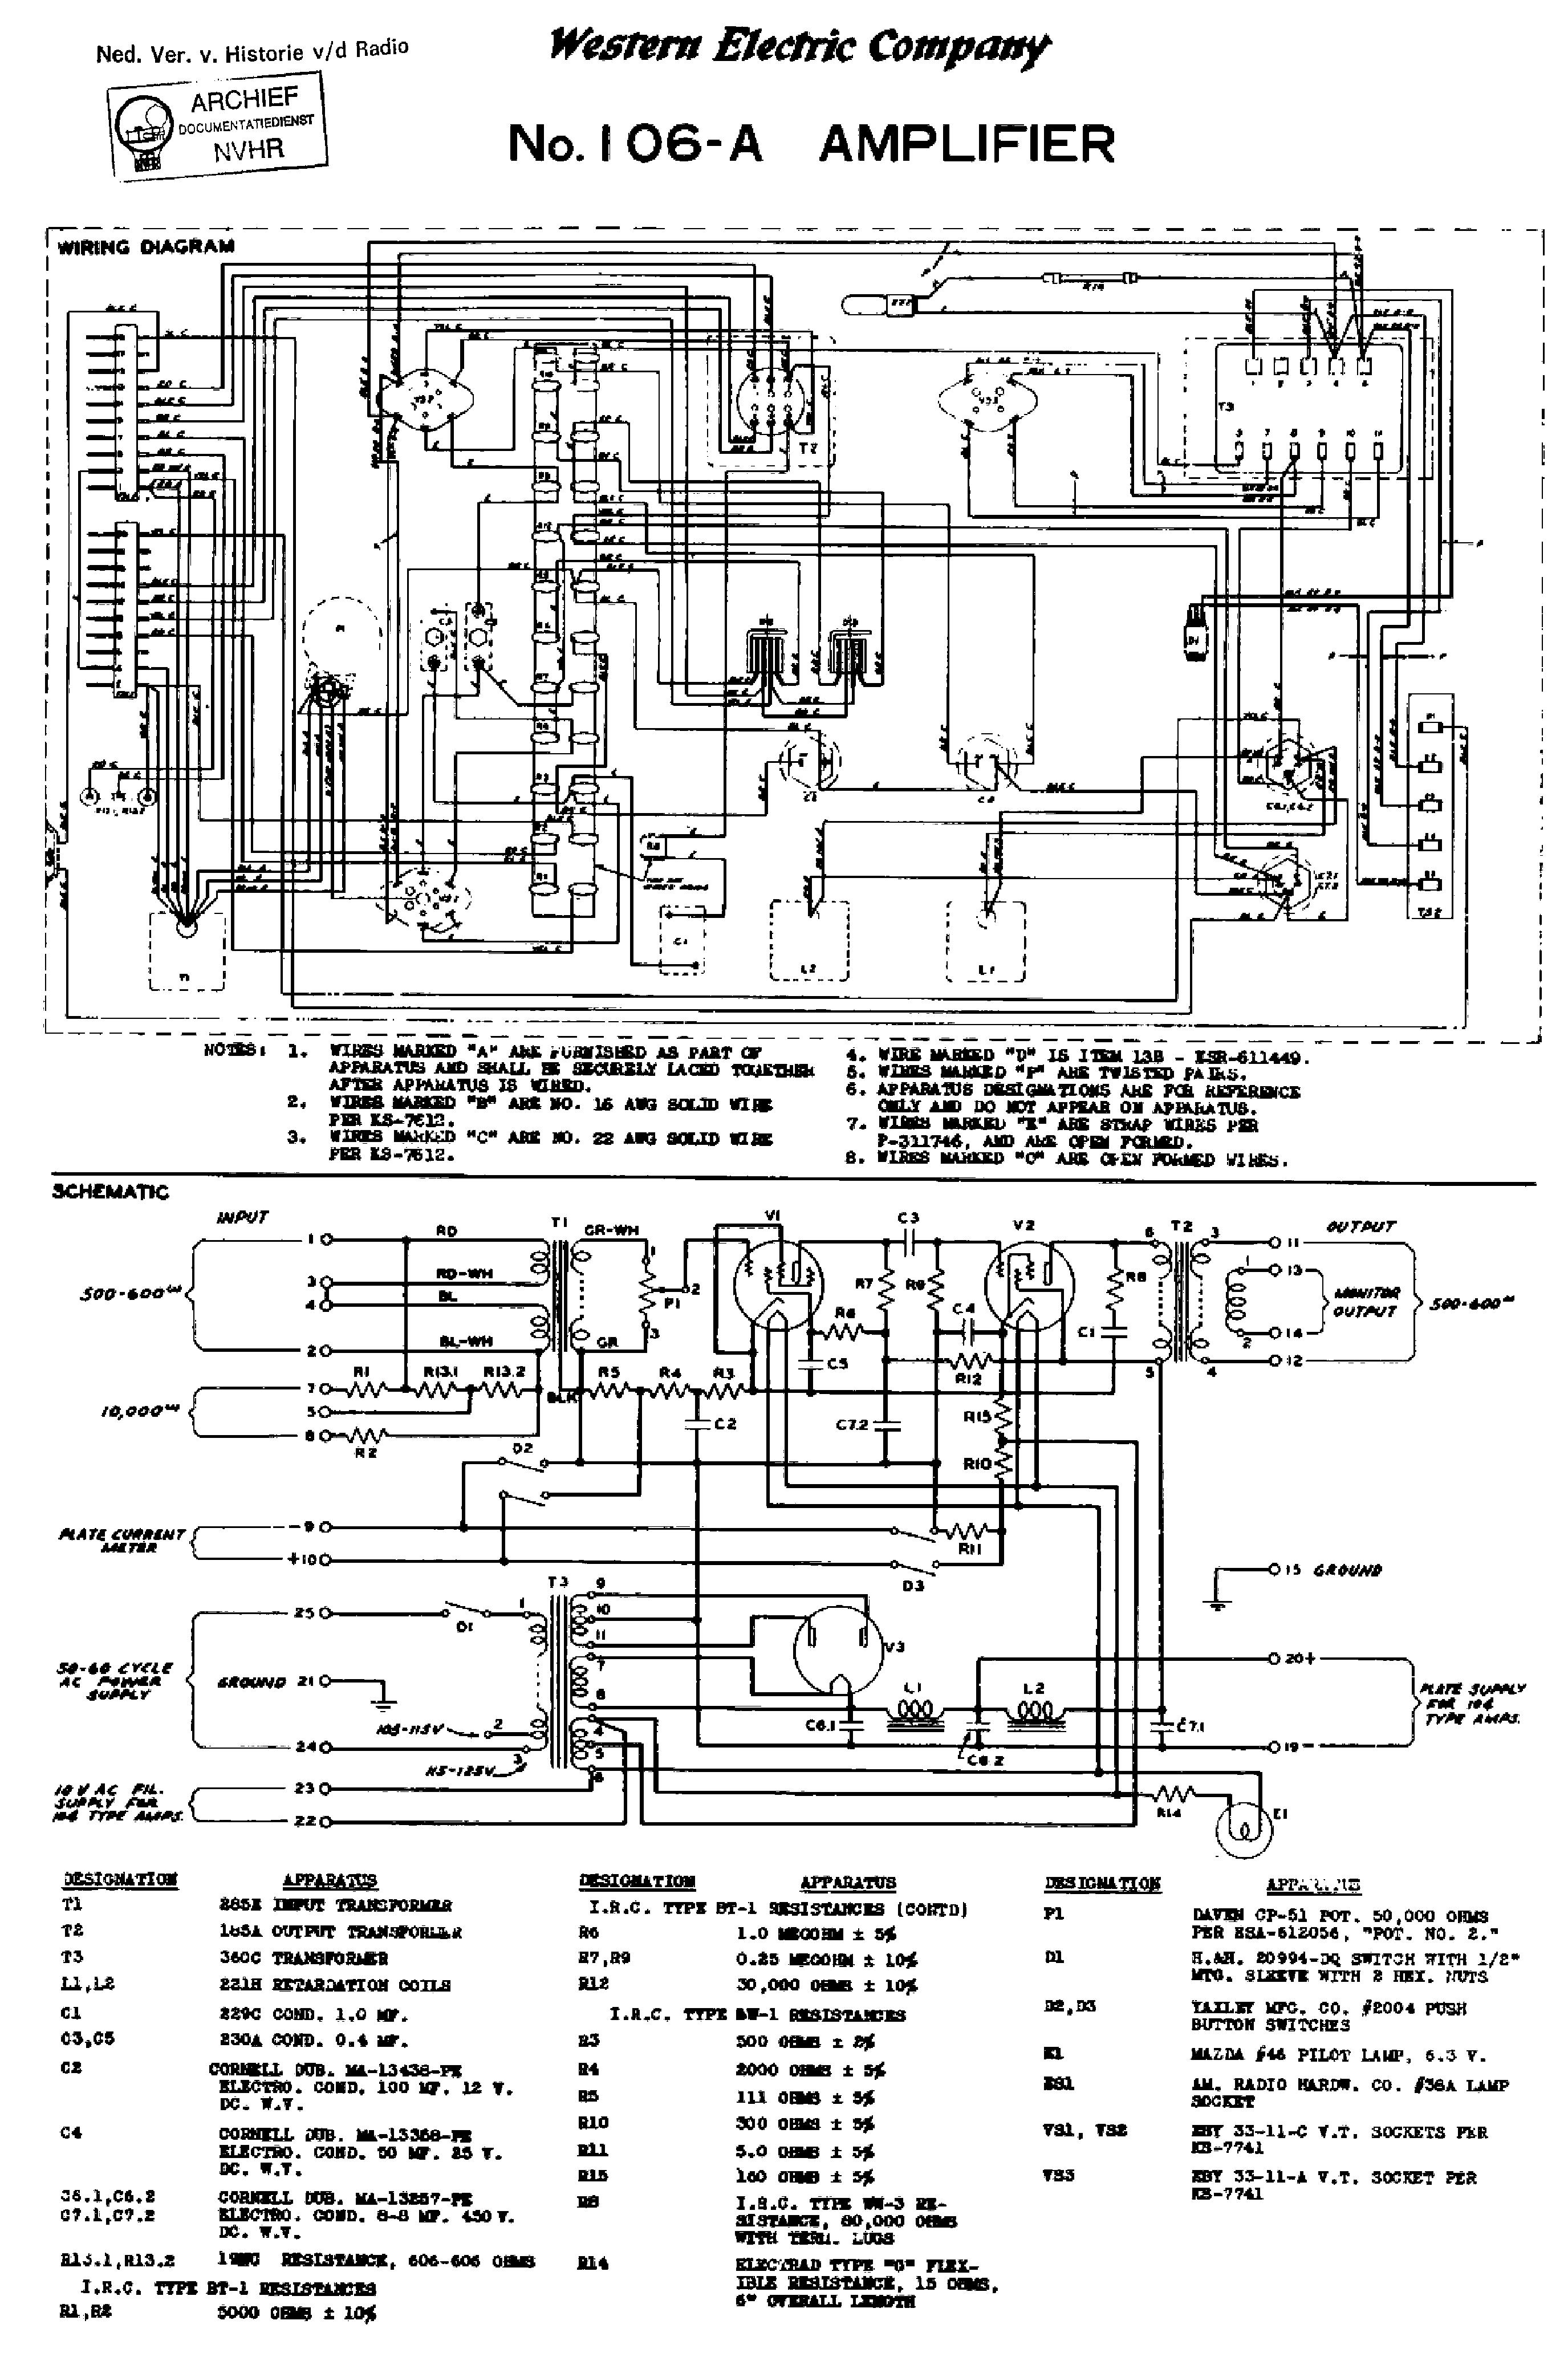 Peugeot 106 Service Manual